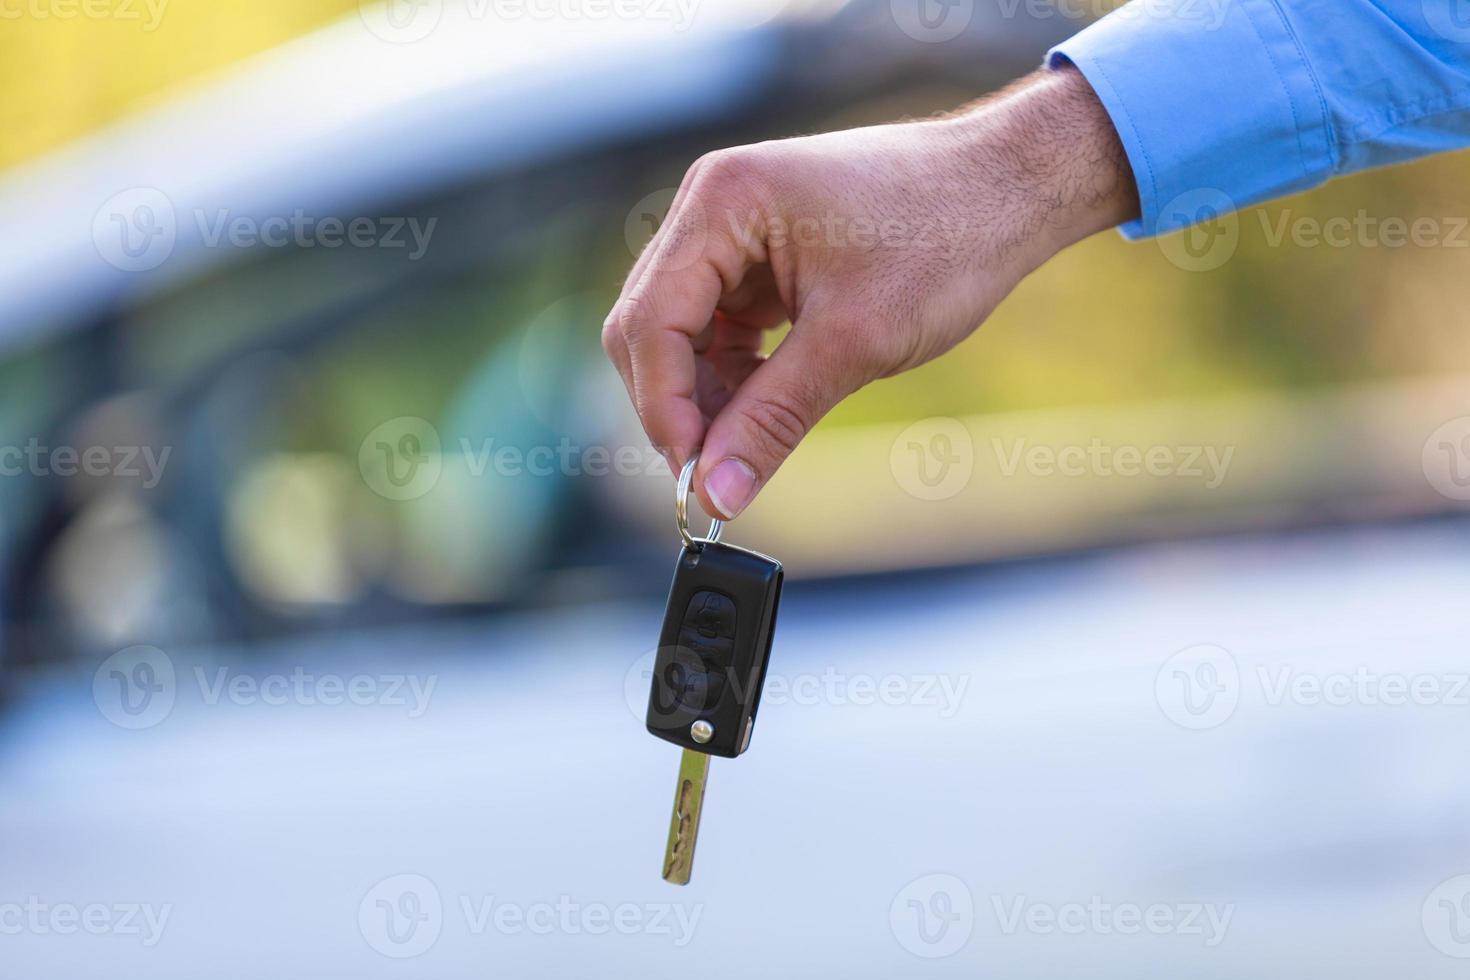 conductor latinoamericano sosteniendo las llaves del auto conduciendo su auto nuevo foto